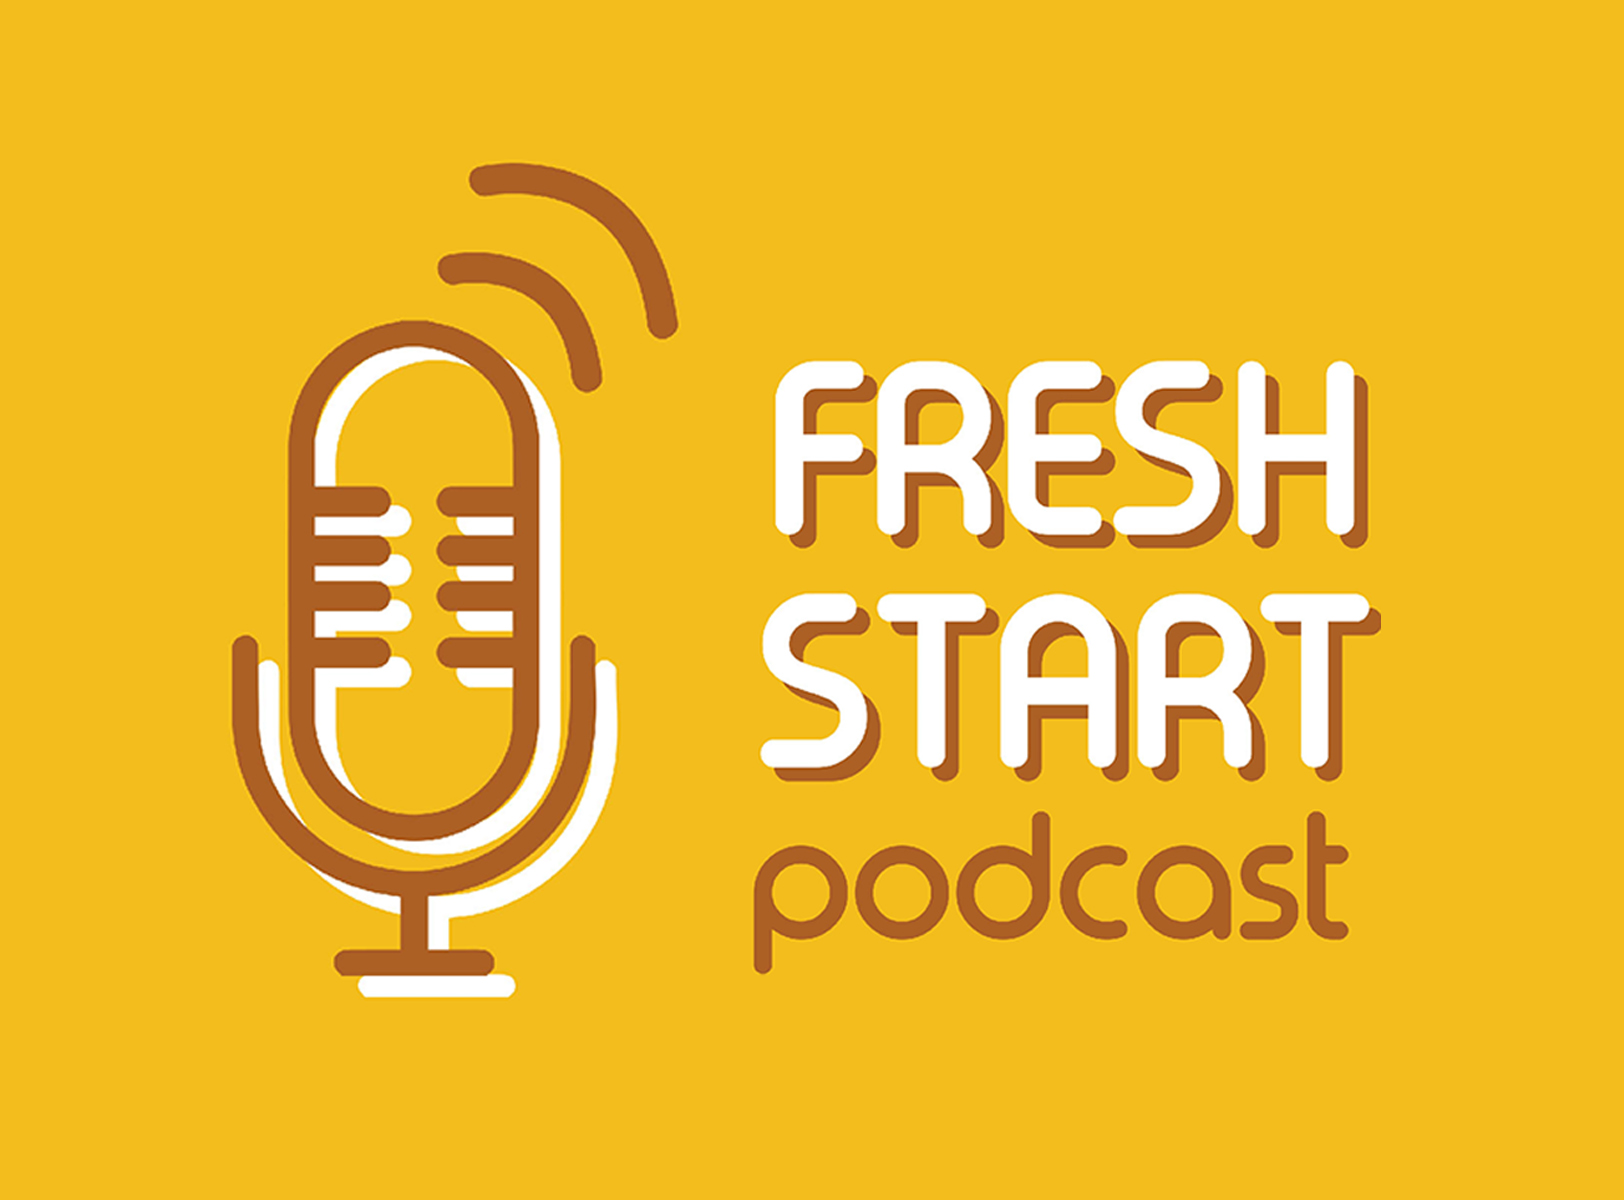 Fresh Start: Podcast News (1/25/2020 Sat.)